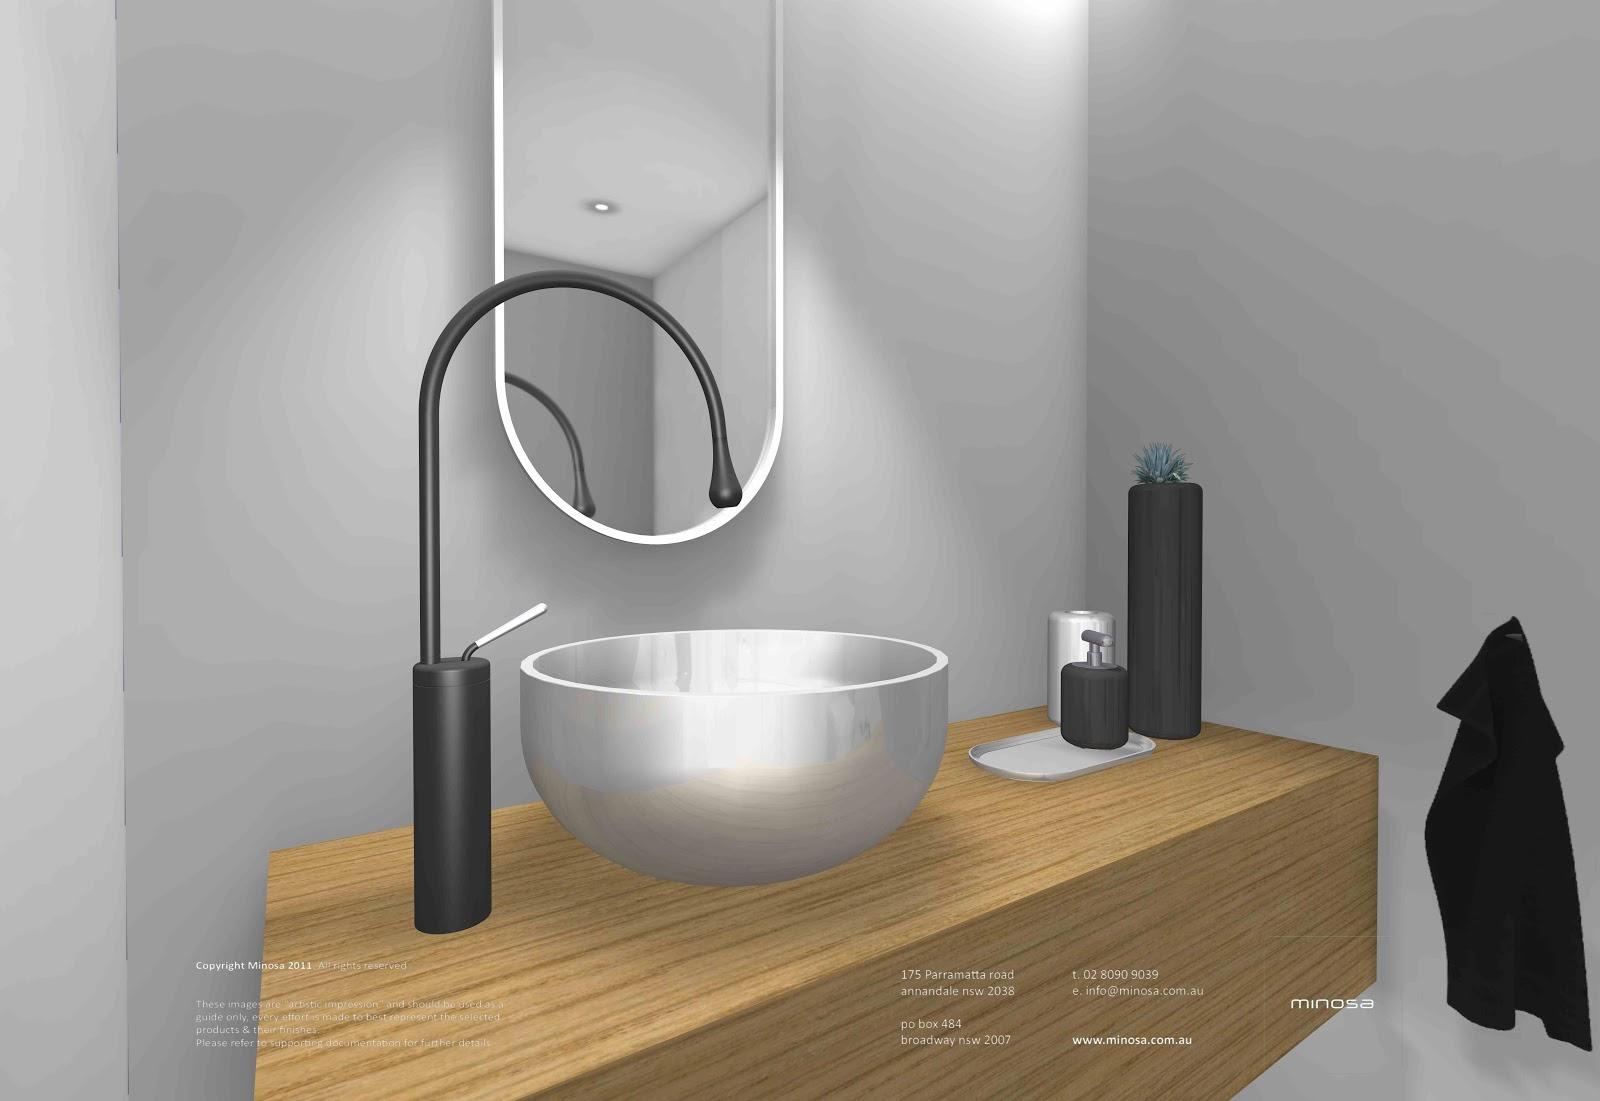 Minosa new minosa bathroom design resort style ensuite - Sydney City Apartment Modern Bathroom Design With Corian Walls